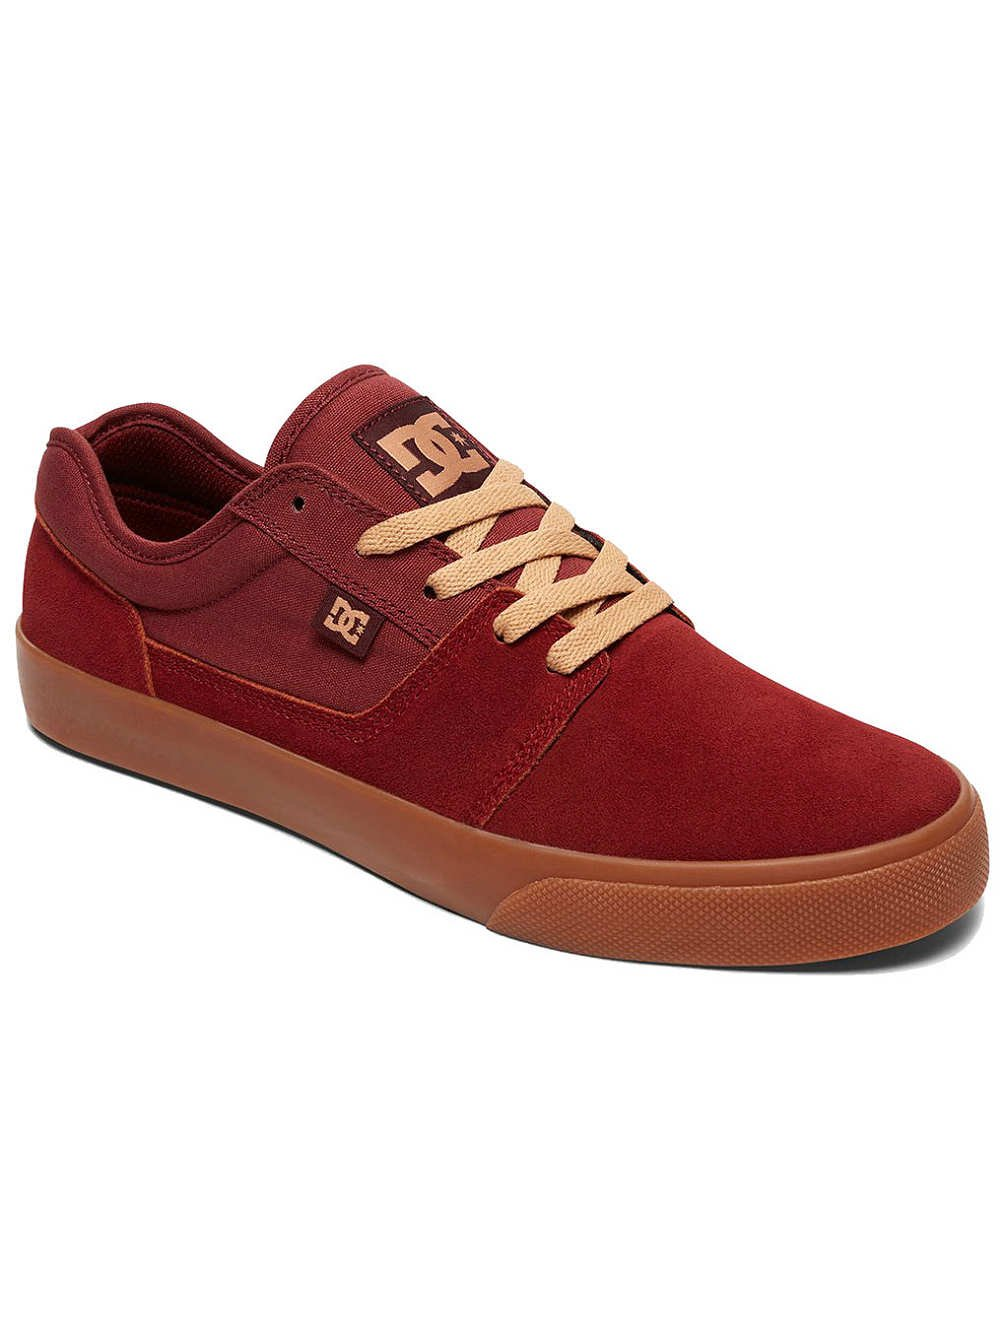 DC TONIK Unisex-Erwachsene Sneakers  47 EU Dark Red